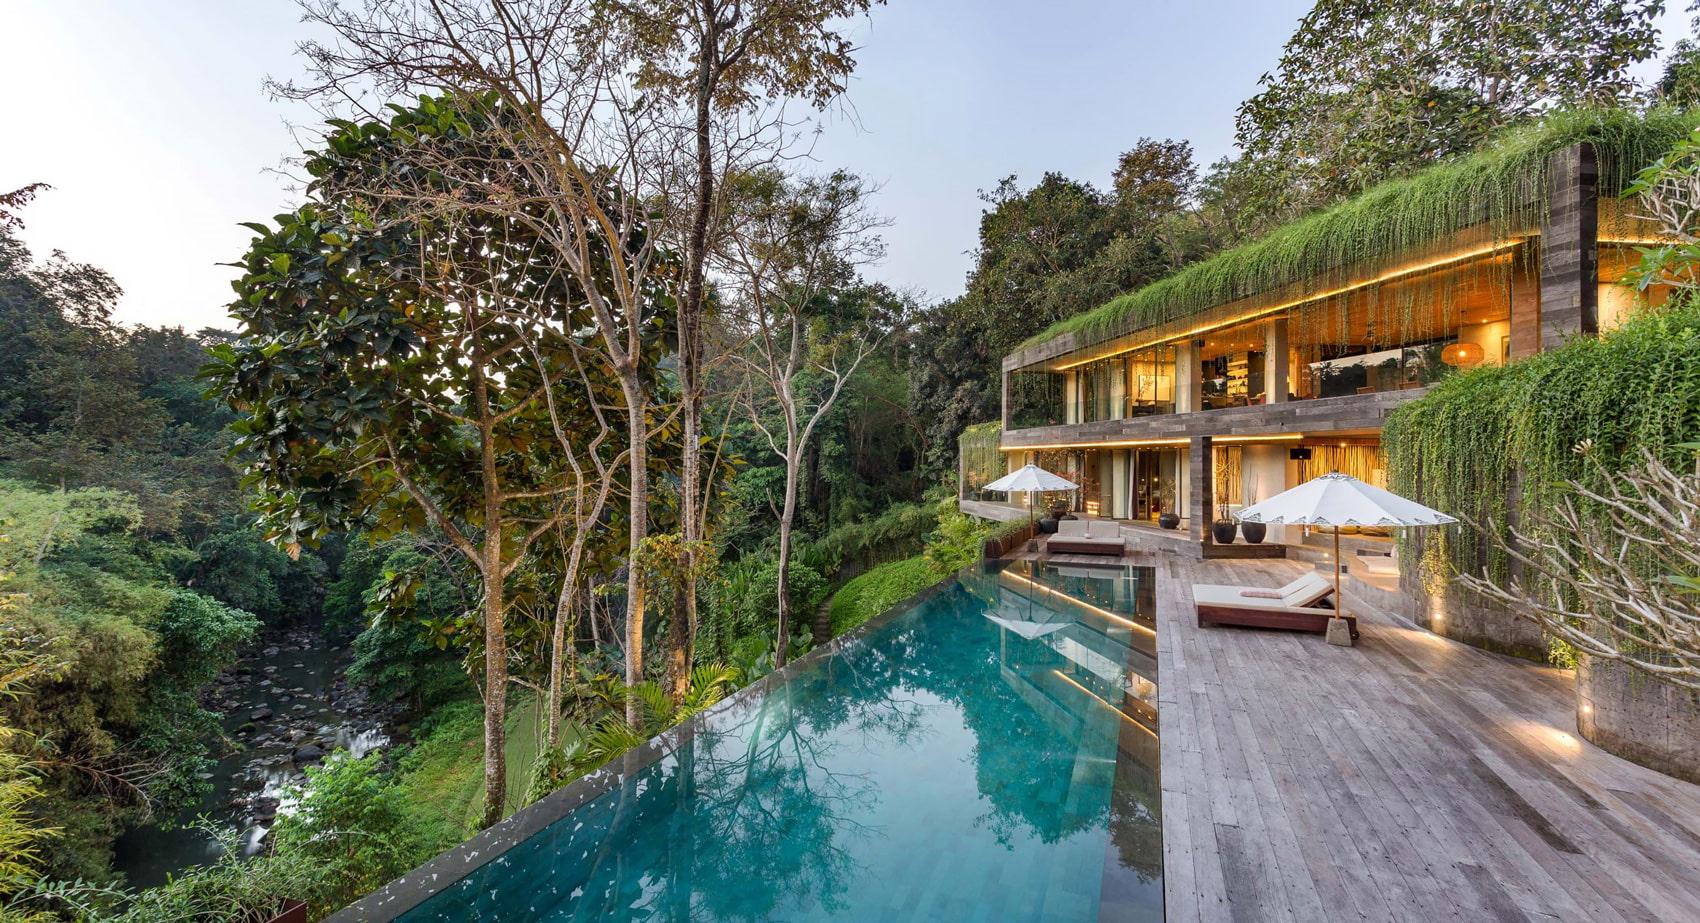 Luxury villa for rent in Bali